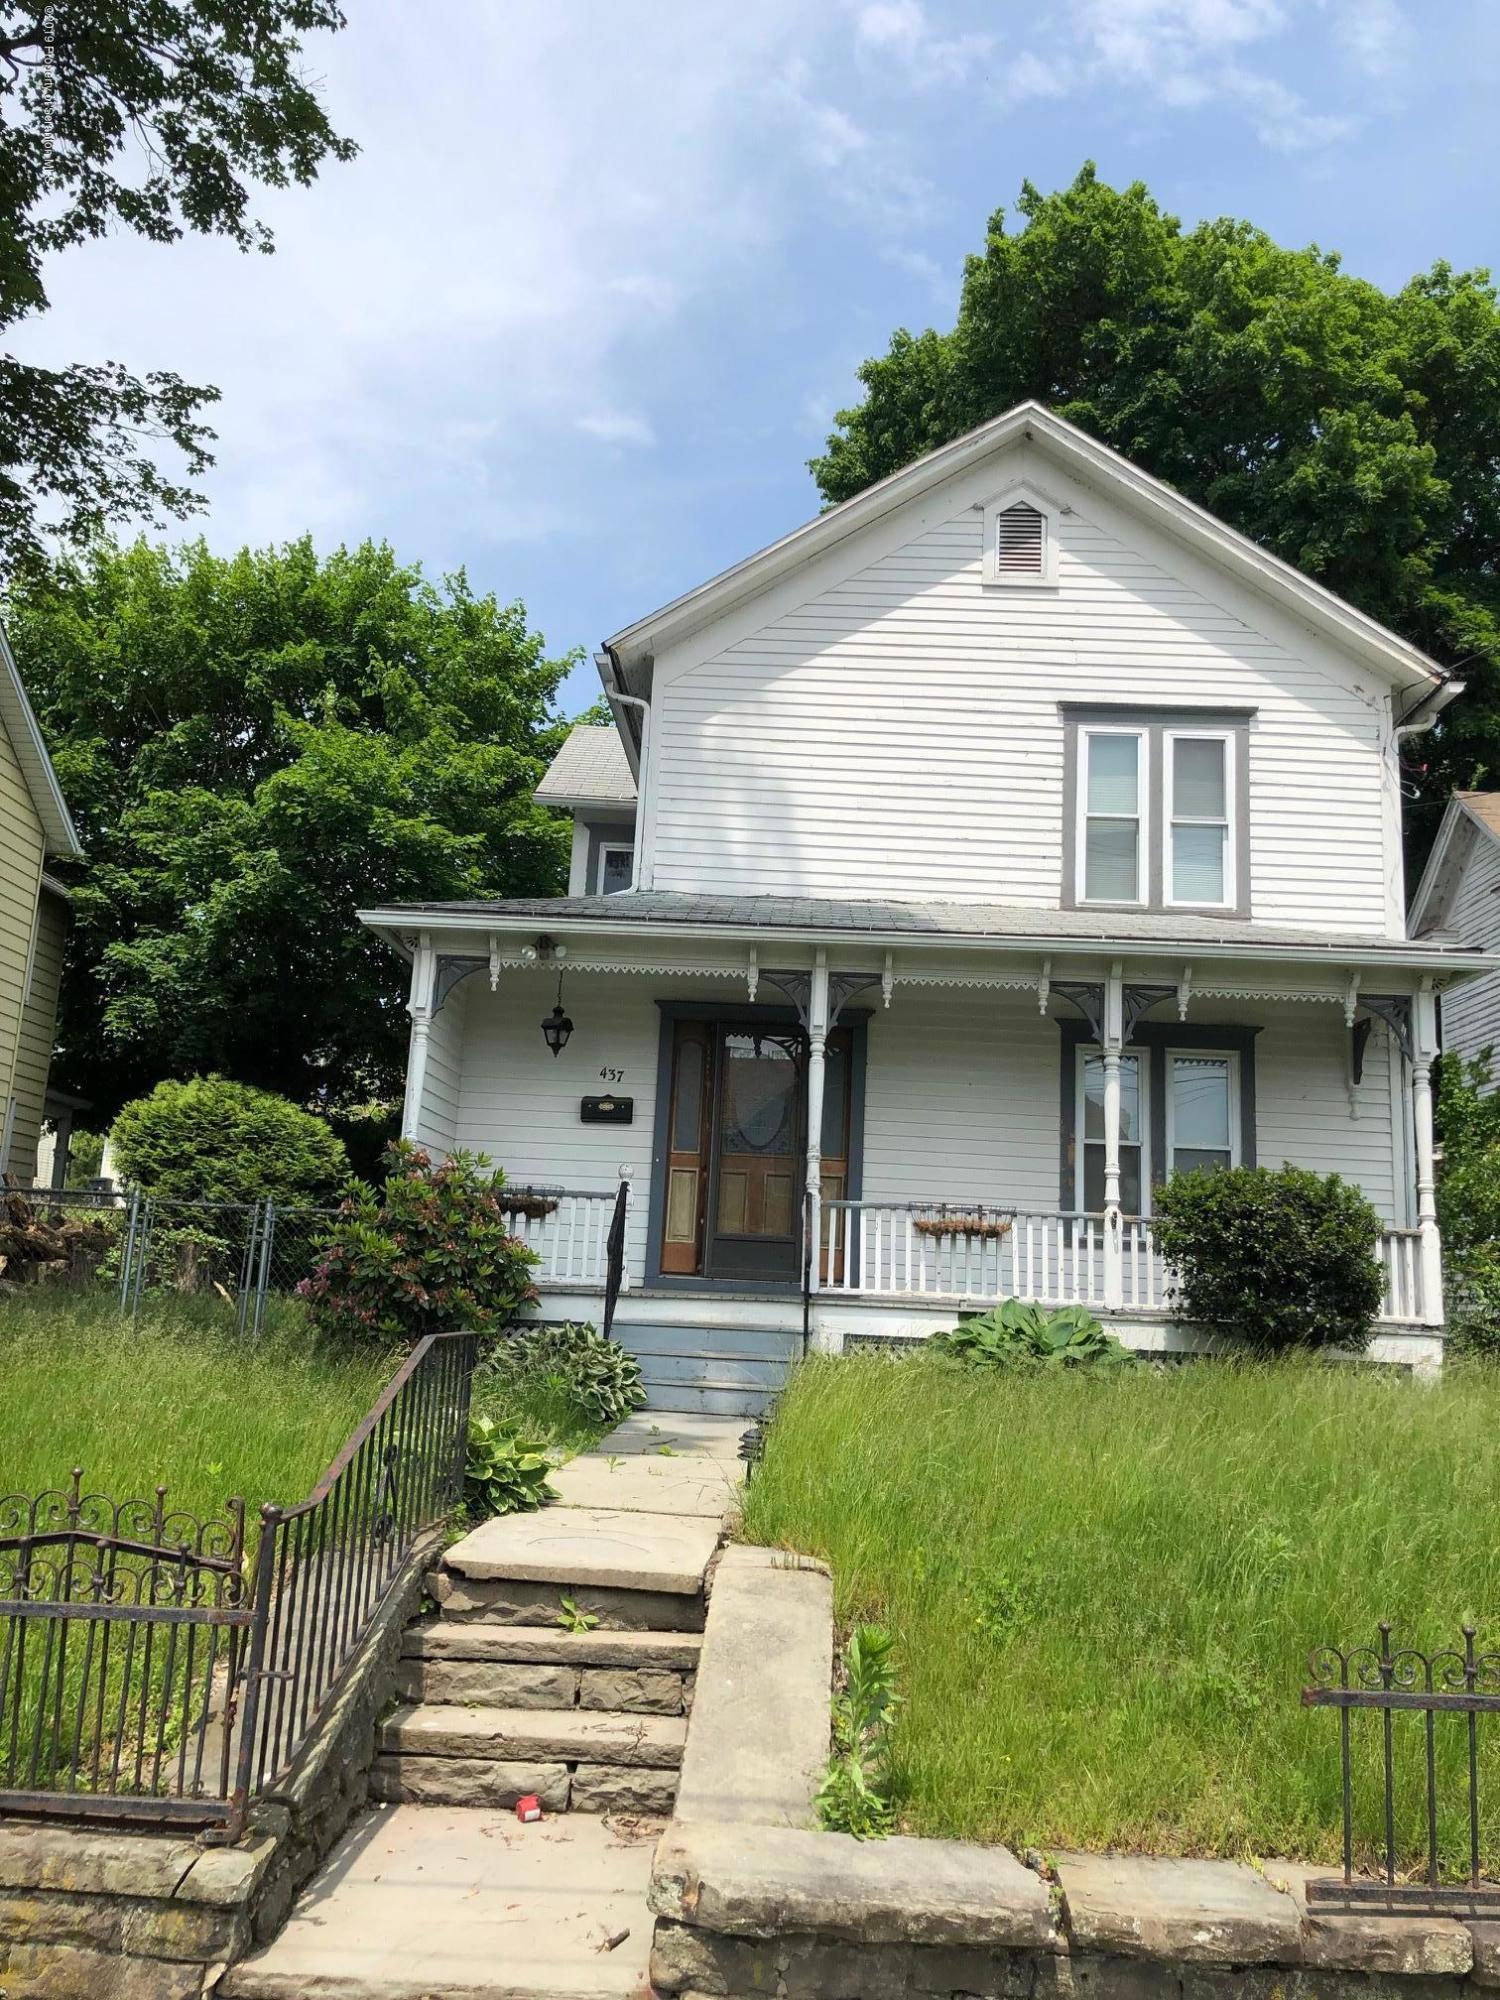 437 Madison Ave, Jermyn, Pennsylvania 18433, 3 Bedrooms Bedrooms, 7 Rooms Rooms,2 BathroomsBathrooms,Single Family,For Sale,Madison,19-2703